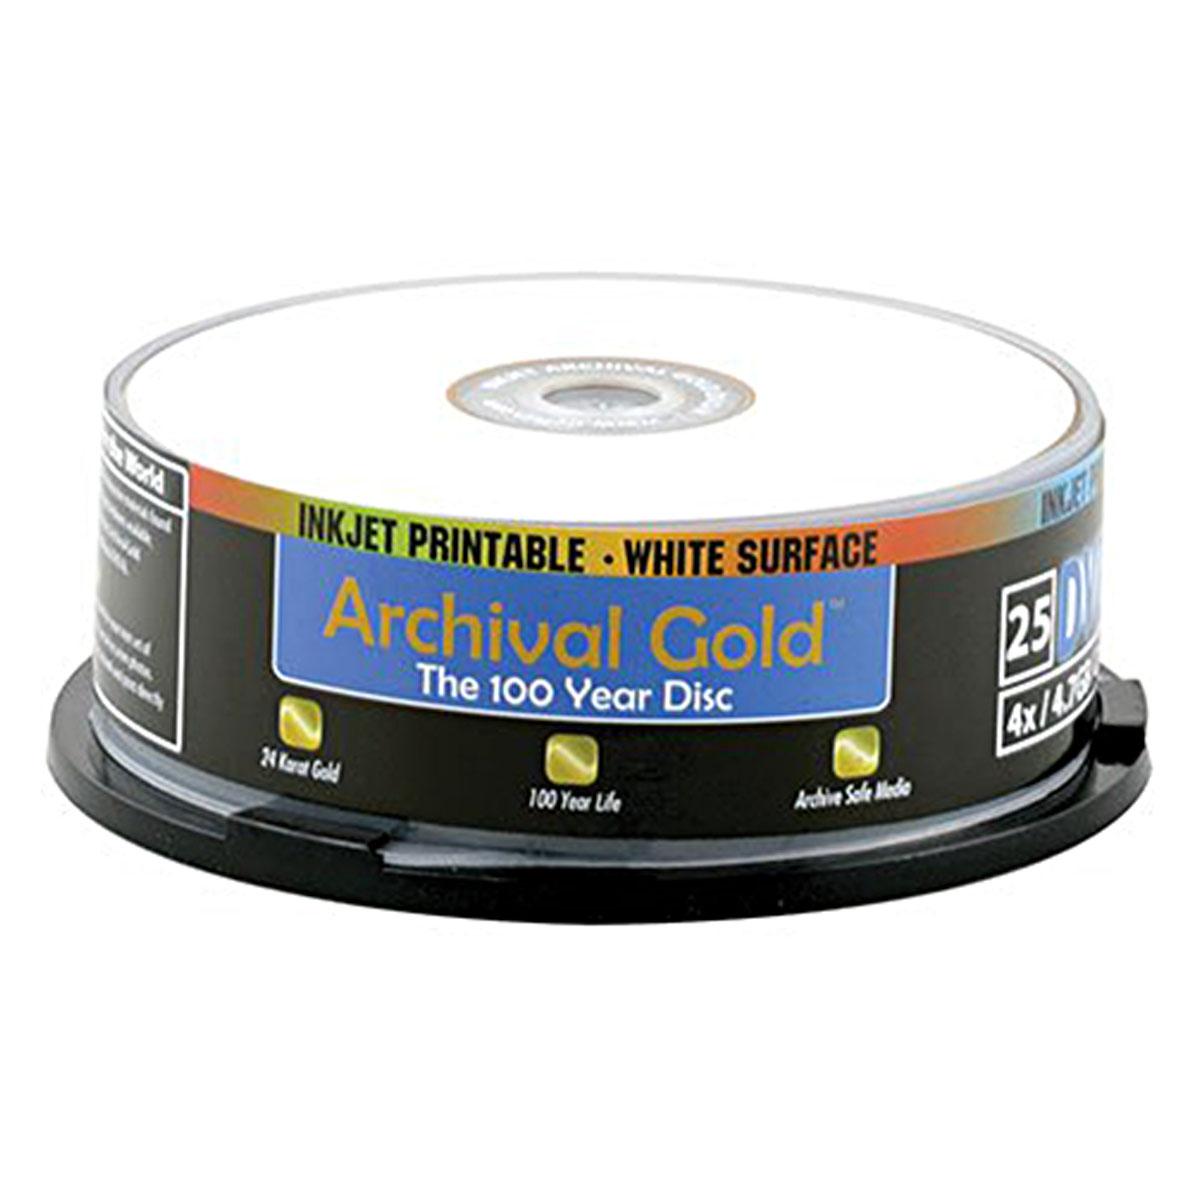 Archival Gold Inkjet DVD-R 25-Pack Spindle